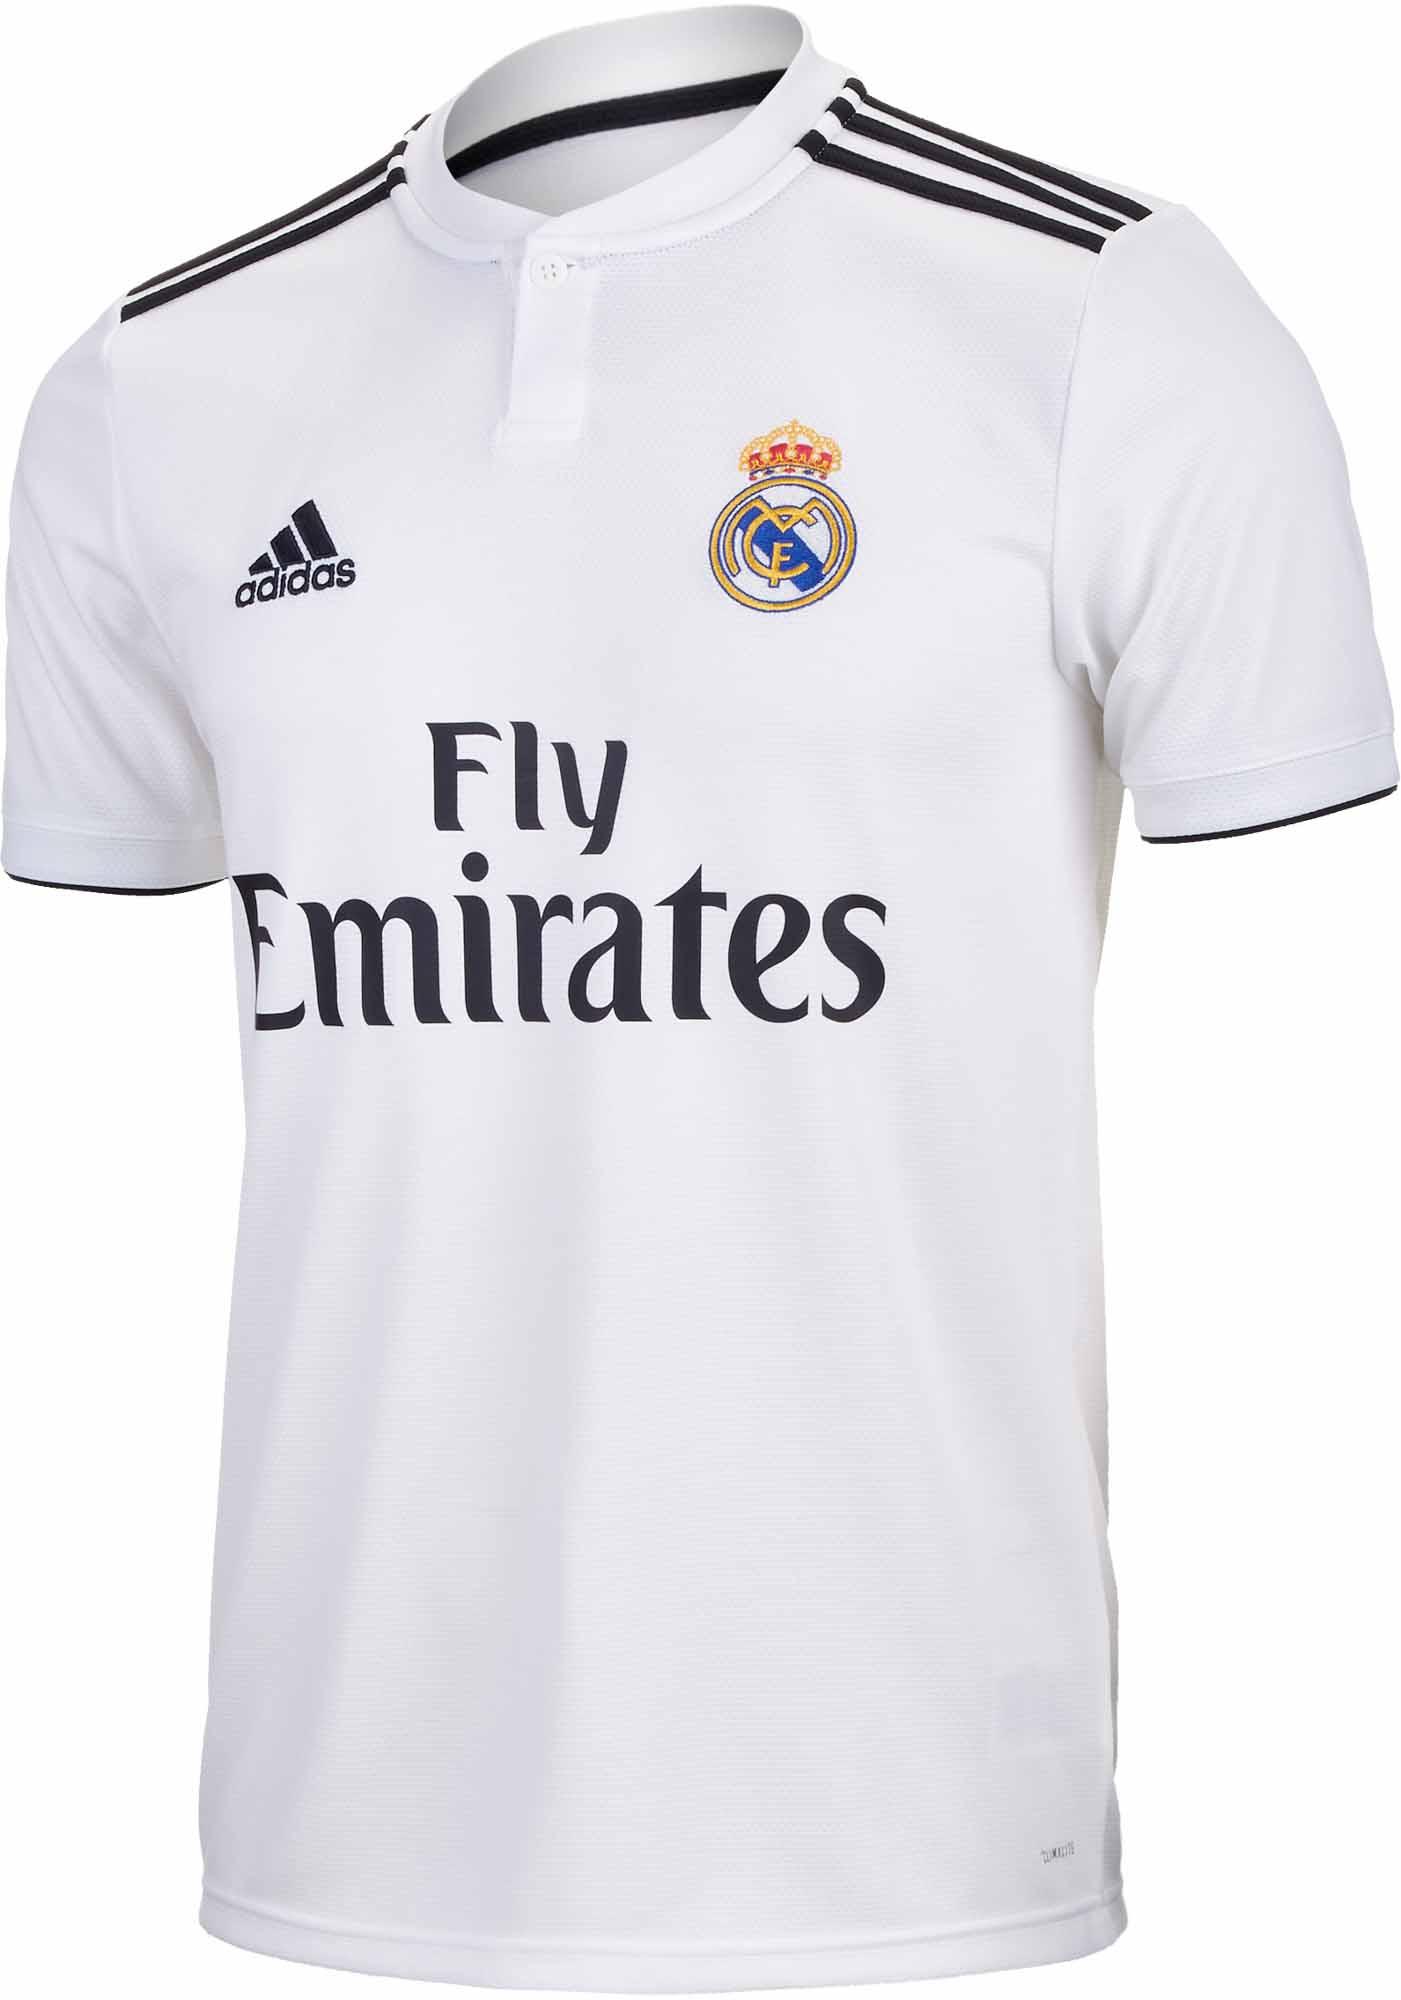 5fc6028d090 adidas Real Madrid Home Jersey 2018-19 - SoccerPro